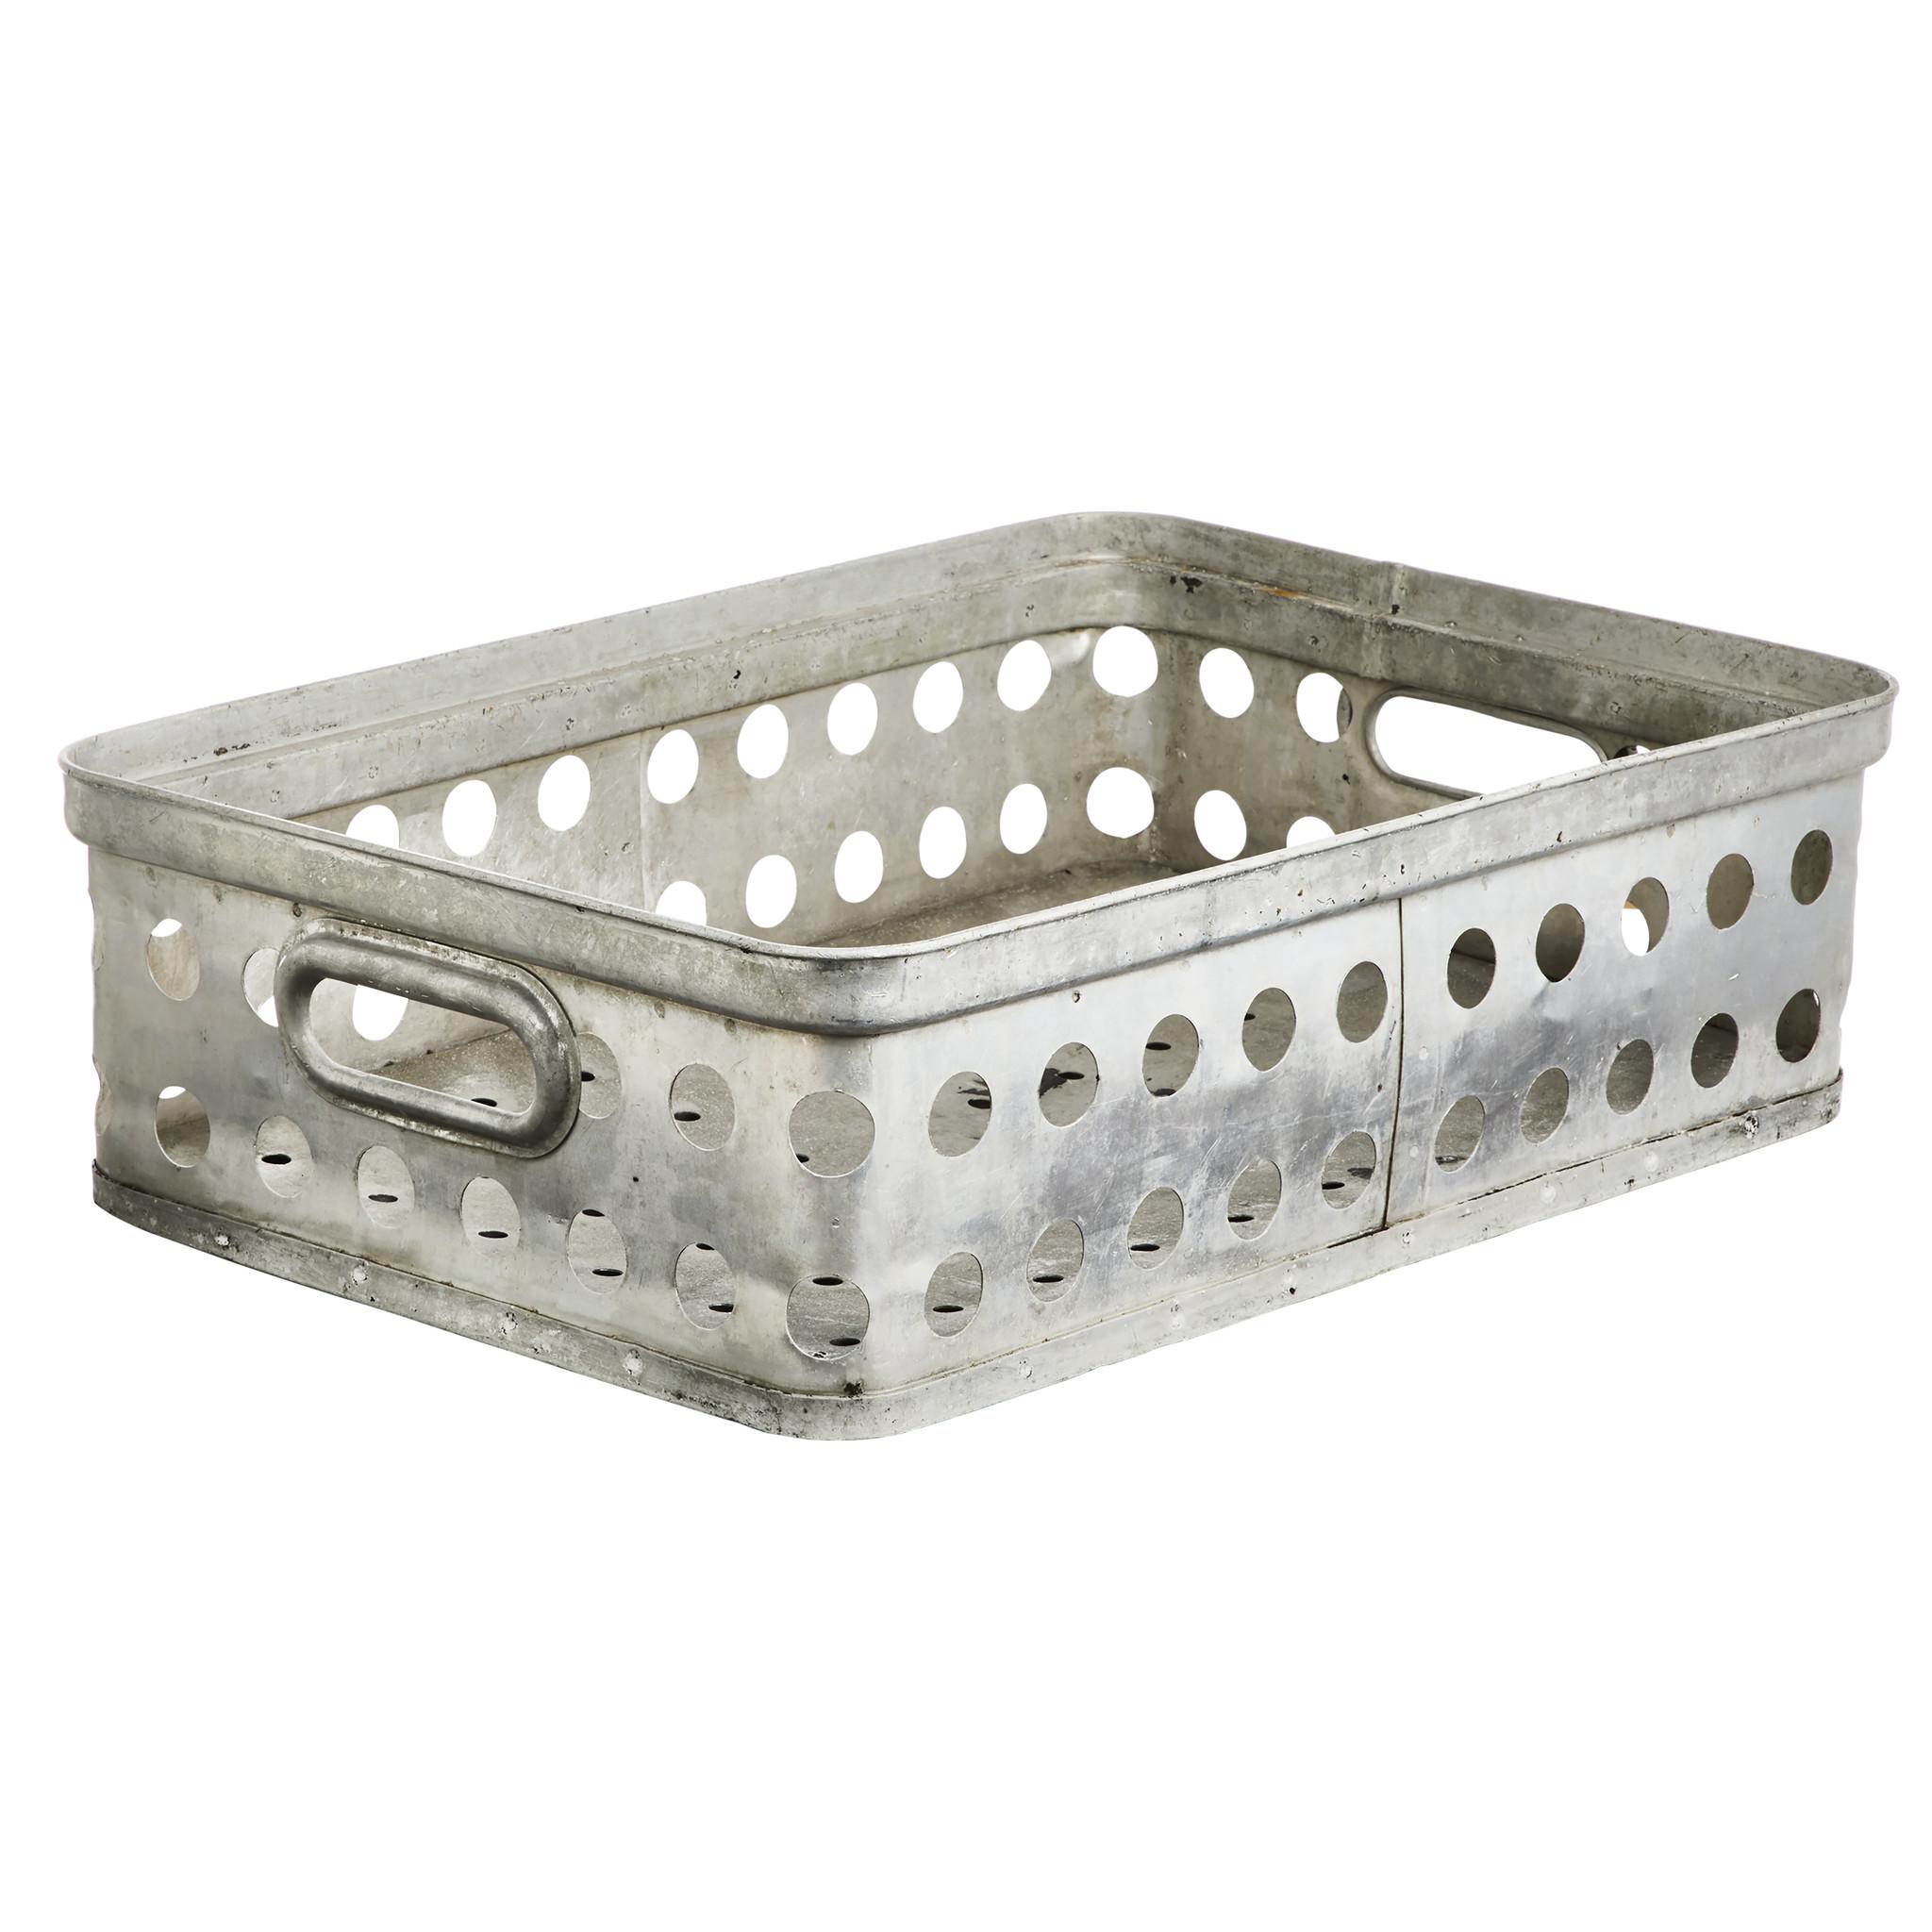 Eiermand/aluminium stapelkrat